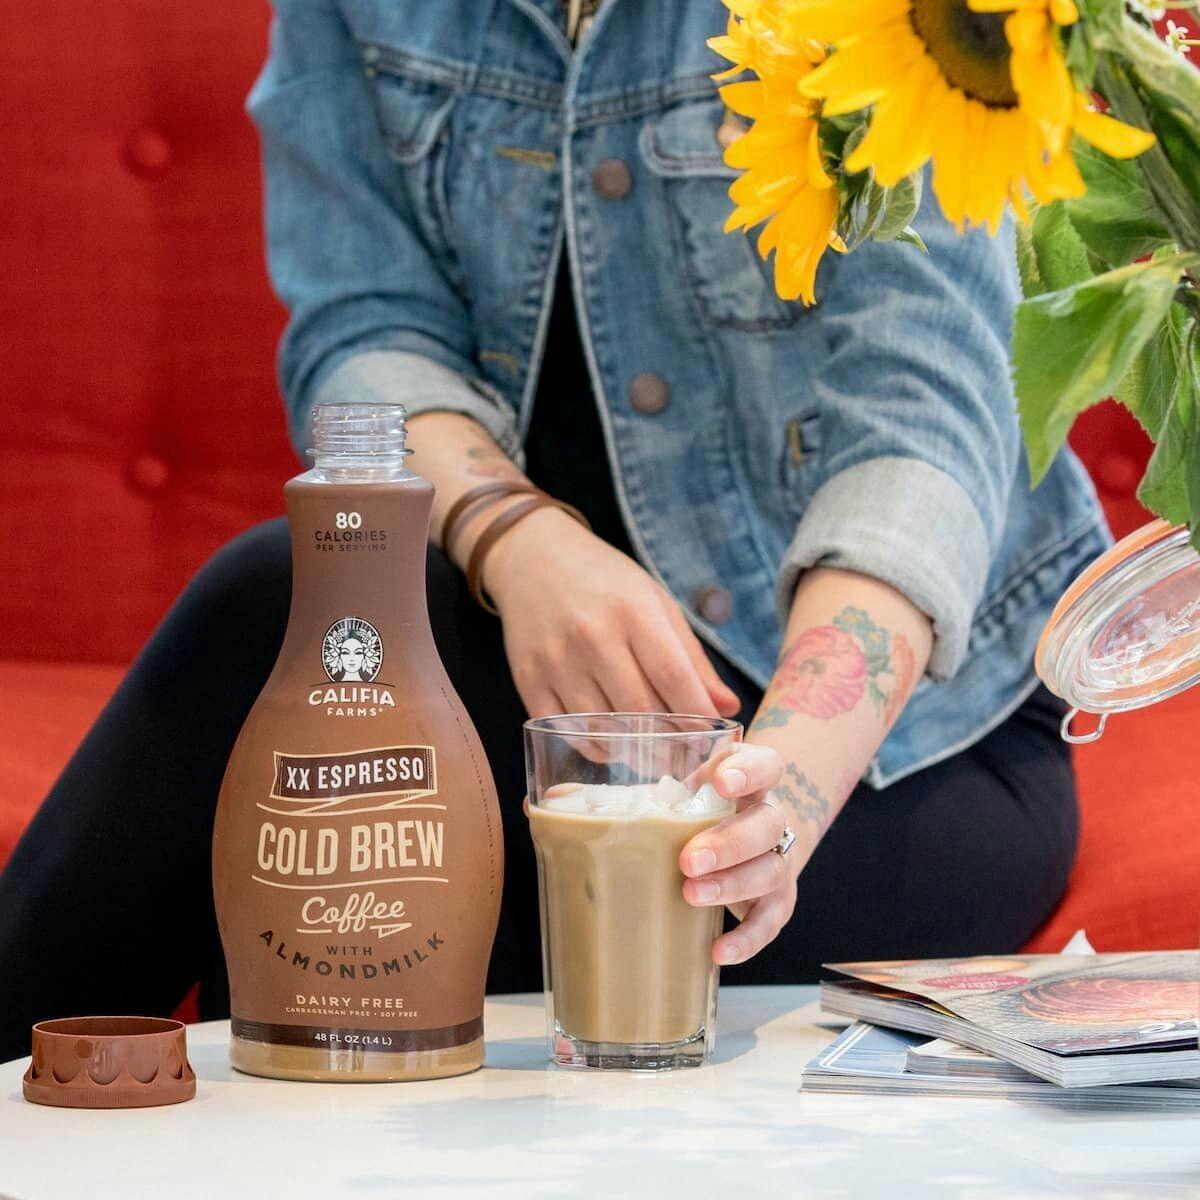 Califia Farms XX Espresso Cold Brew coffee with Almond milk 750ml £1 Fultons Foods